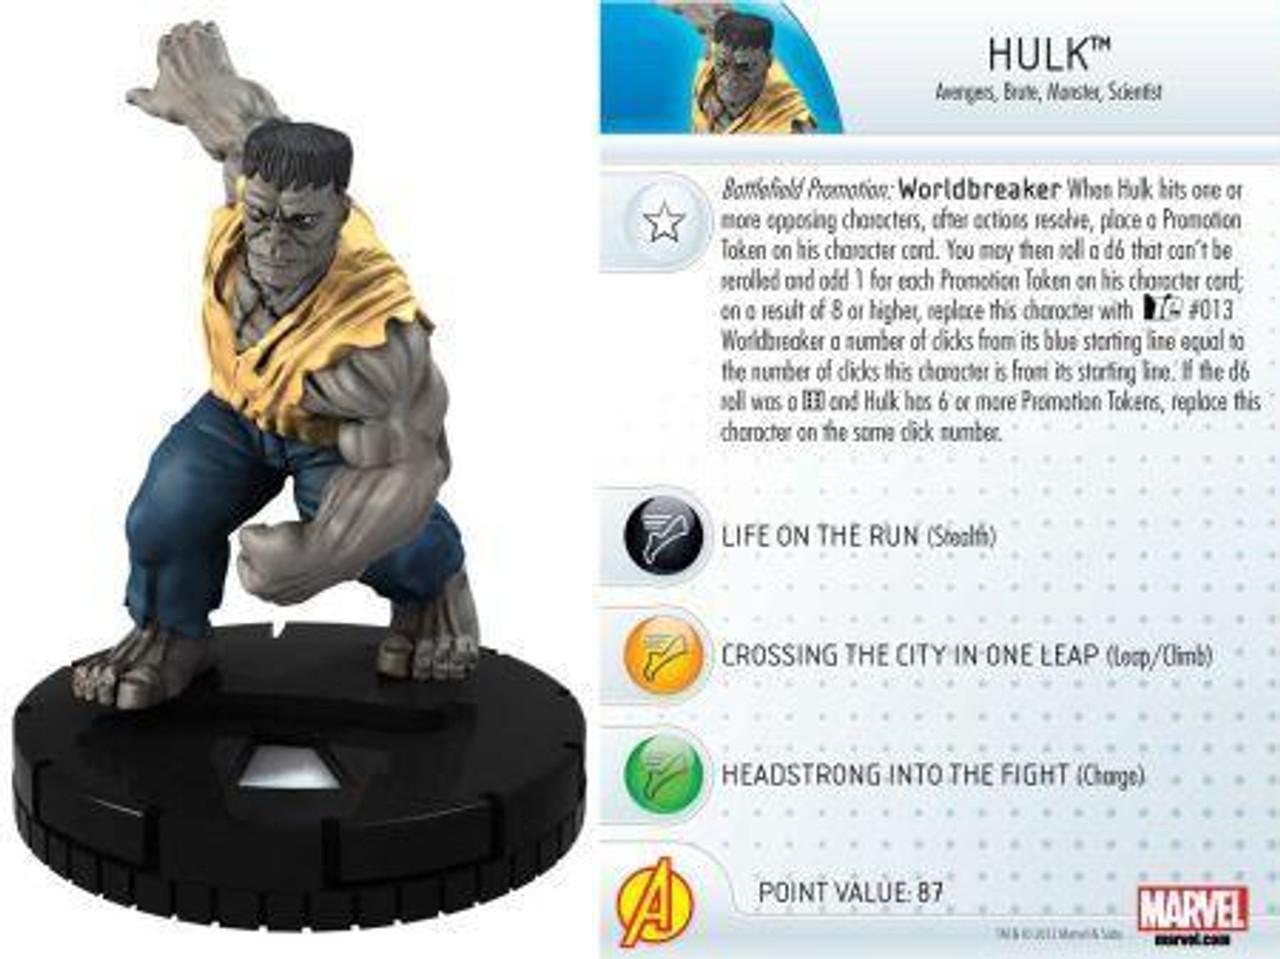 Marvel 10th Anniversary HeroClix Hulk #002